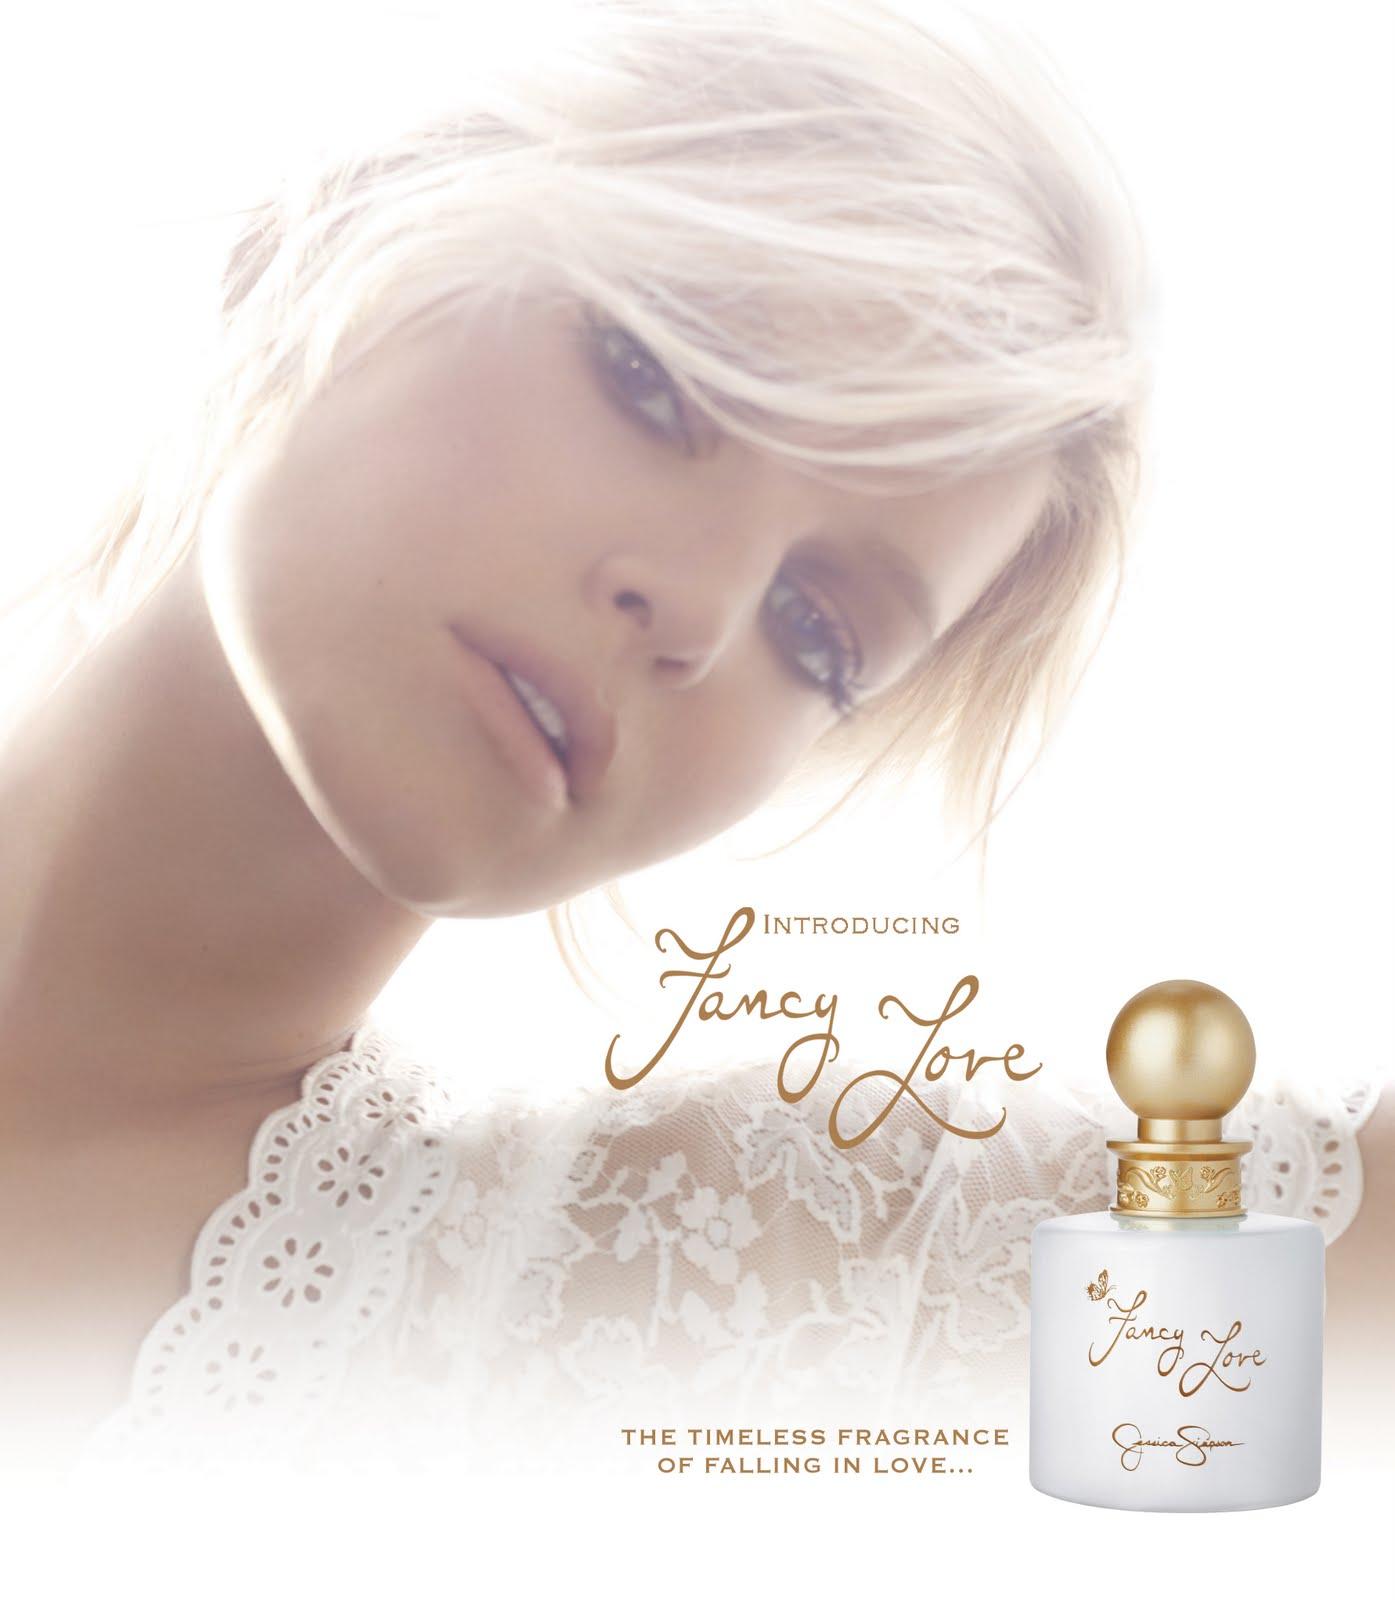 http://3.bp.blogspot.com/_zvM-PTHDY9w/S-3WEIeTjfI/AAAAAAAAAyY/odzH0CxccBI/s1600/JS+FancyLove_Poster.jpg